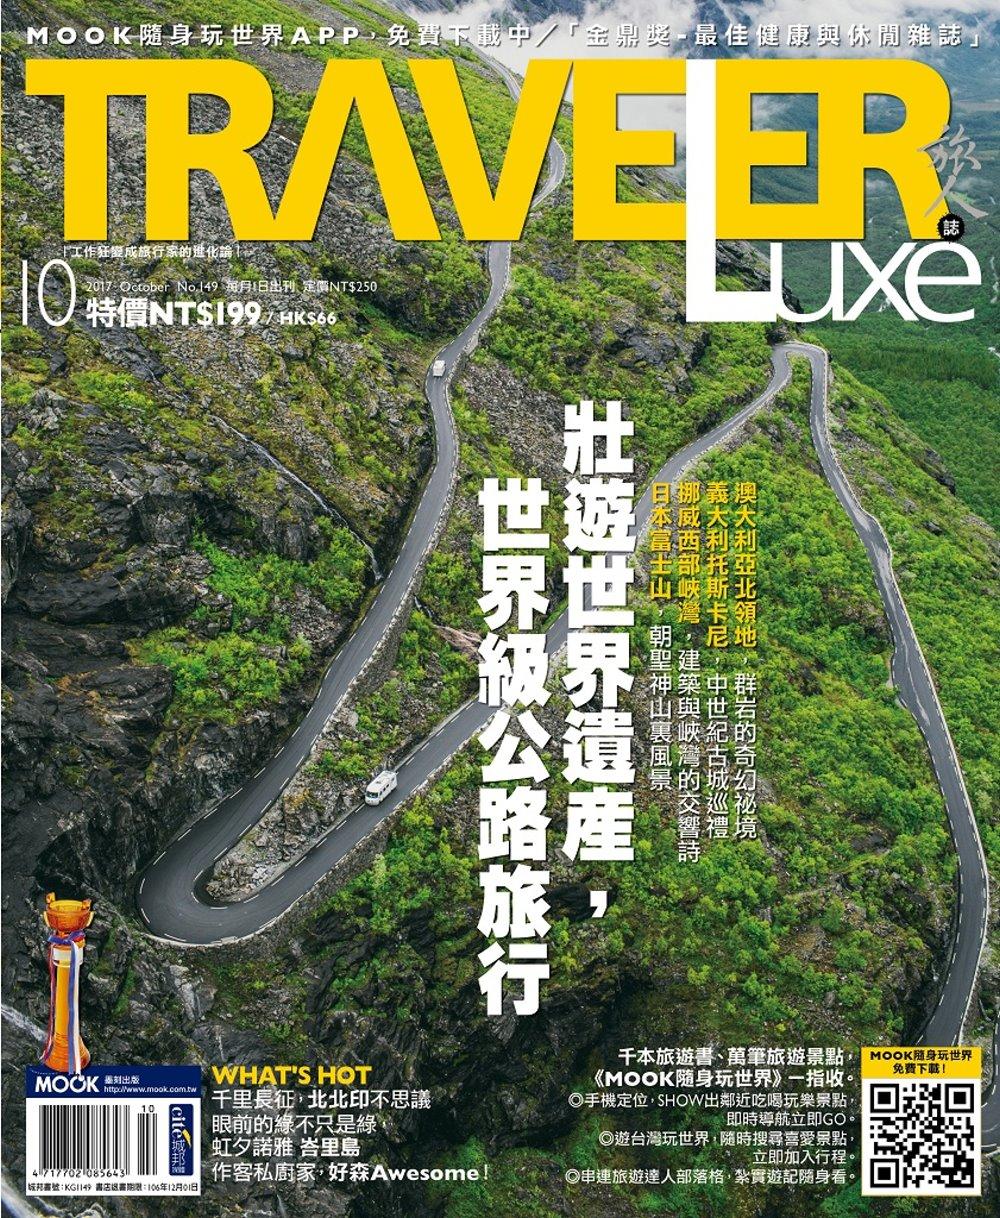 TRAVELER LUXE 旅人誌 10月號/2017 第149期